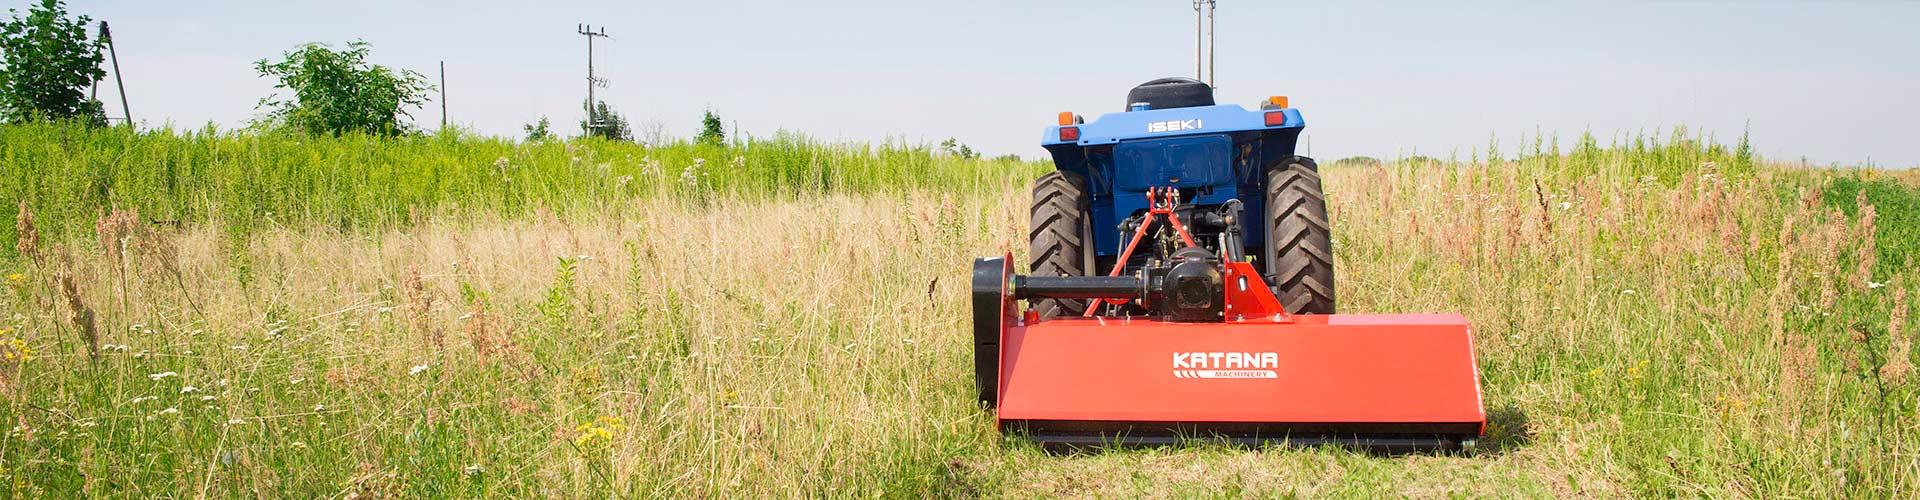 KATANA flail mower for compact tractor